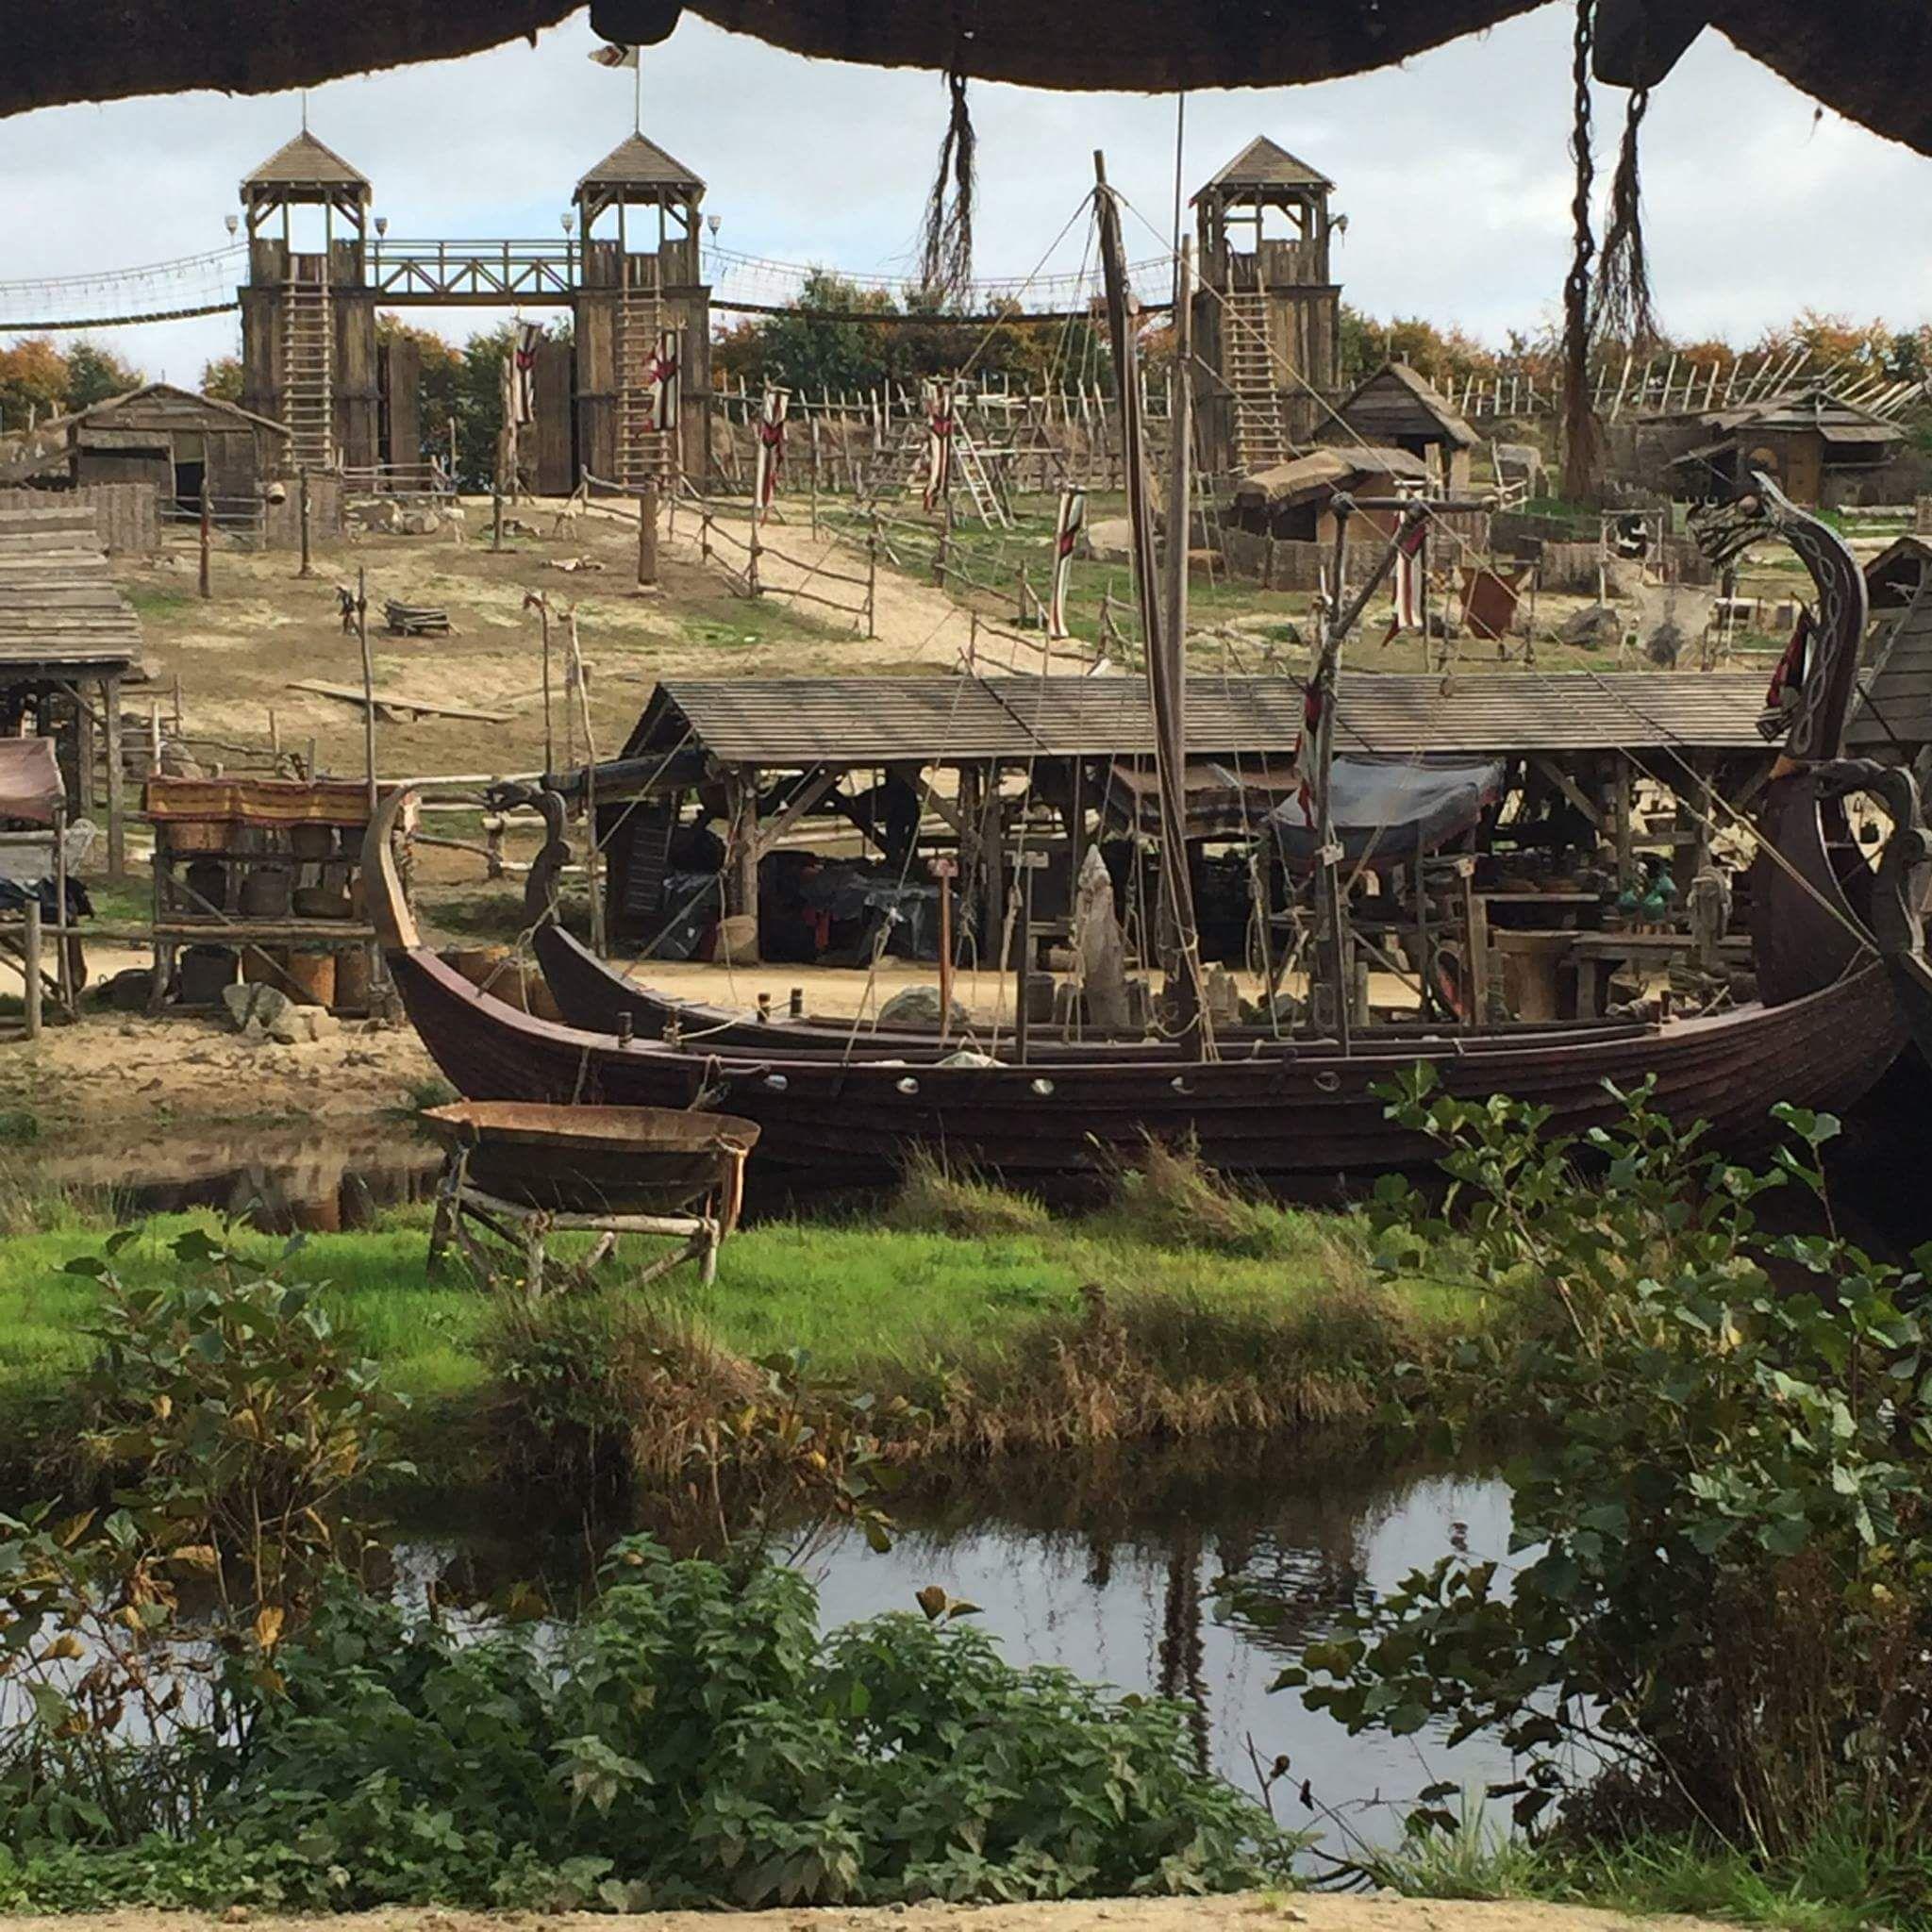 This Is Kattegat. This Is Home. ~ Vikings